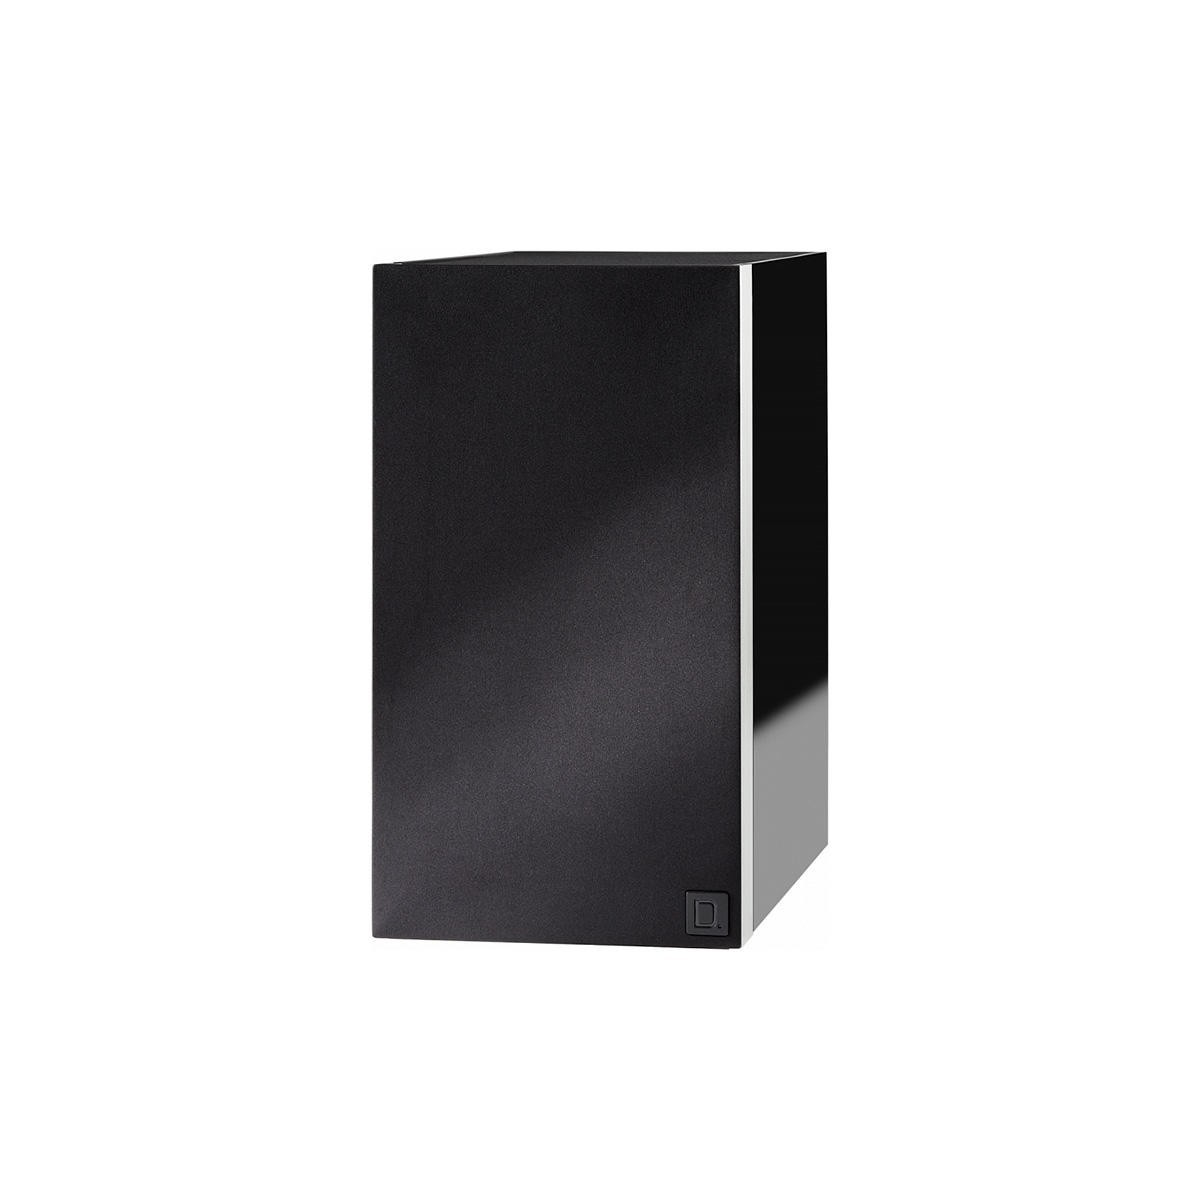 Kompaktlautsprecher DEMAND 11 (Paarpreis)